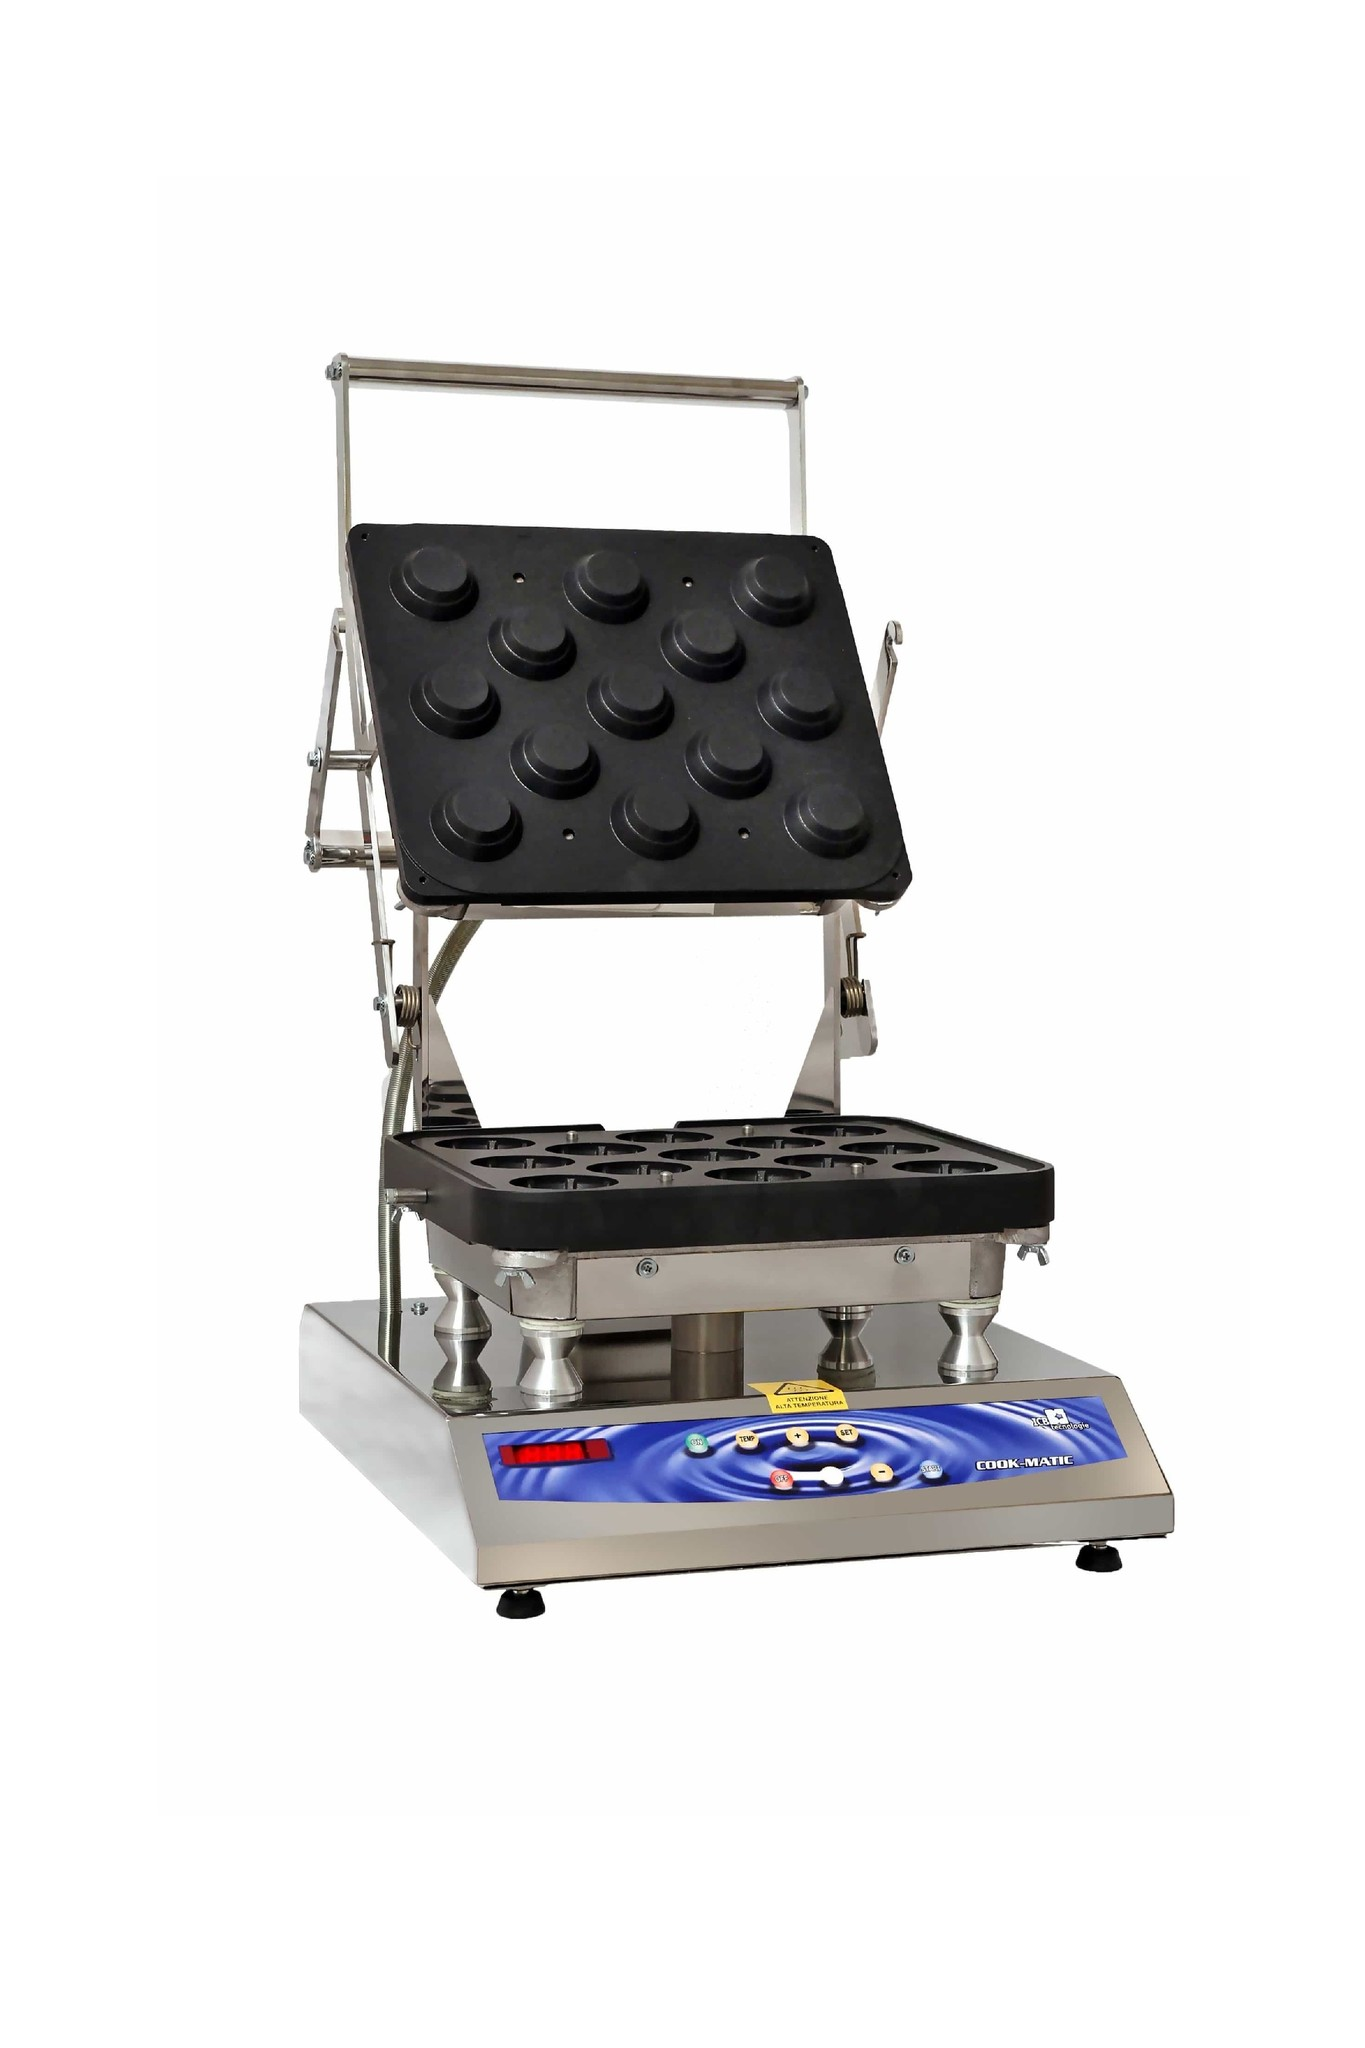 ICB Tecnologie Cook-Matic Tartelettemachine